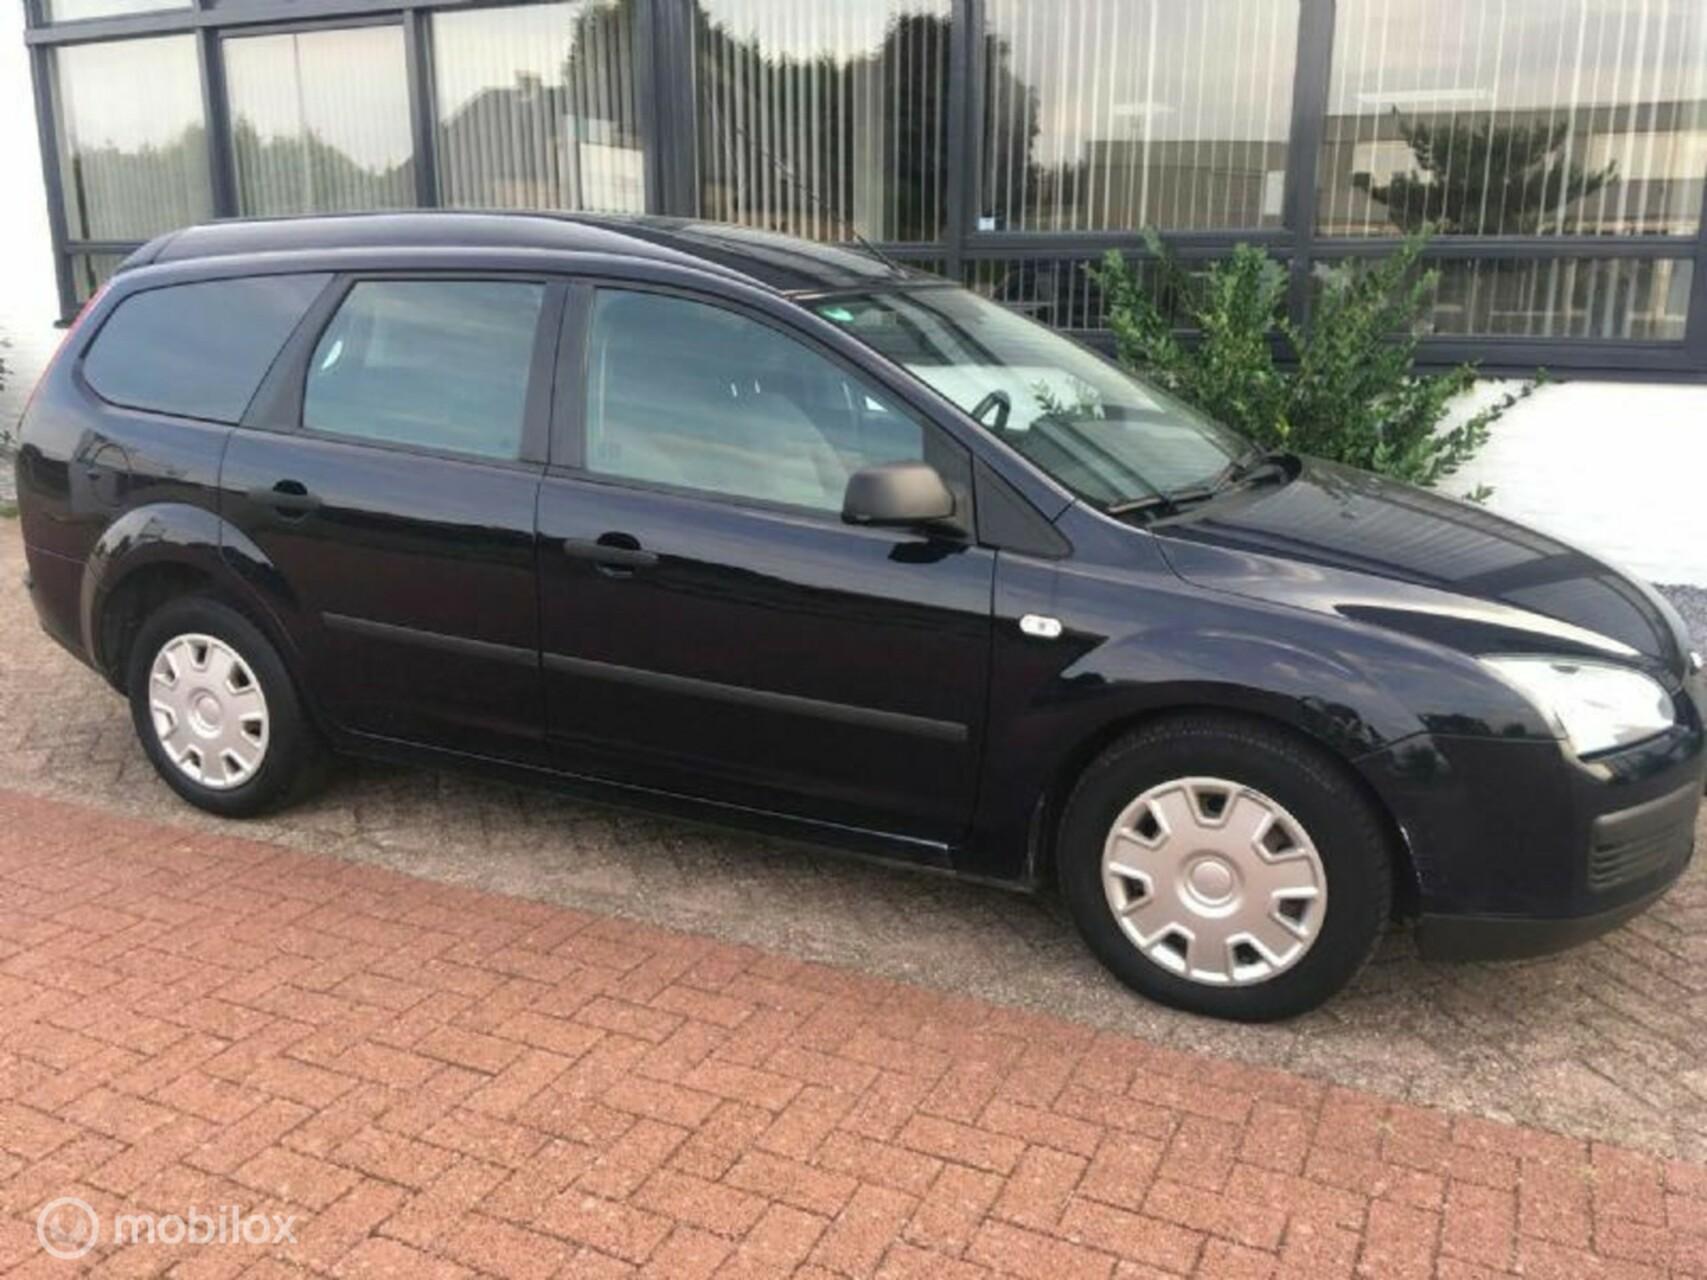 Ford Focus - Van 1.6 TDCI AUTOMAAT € 1750, - EX BTW